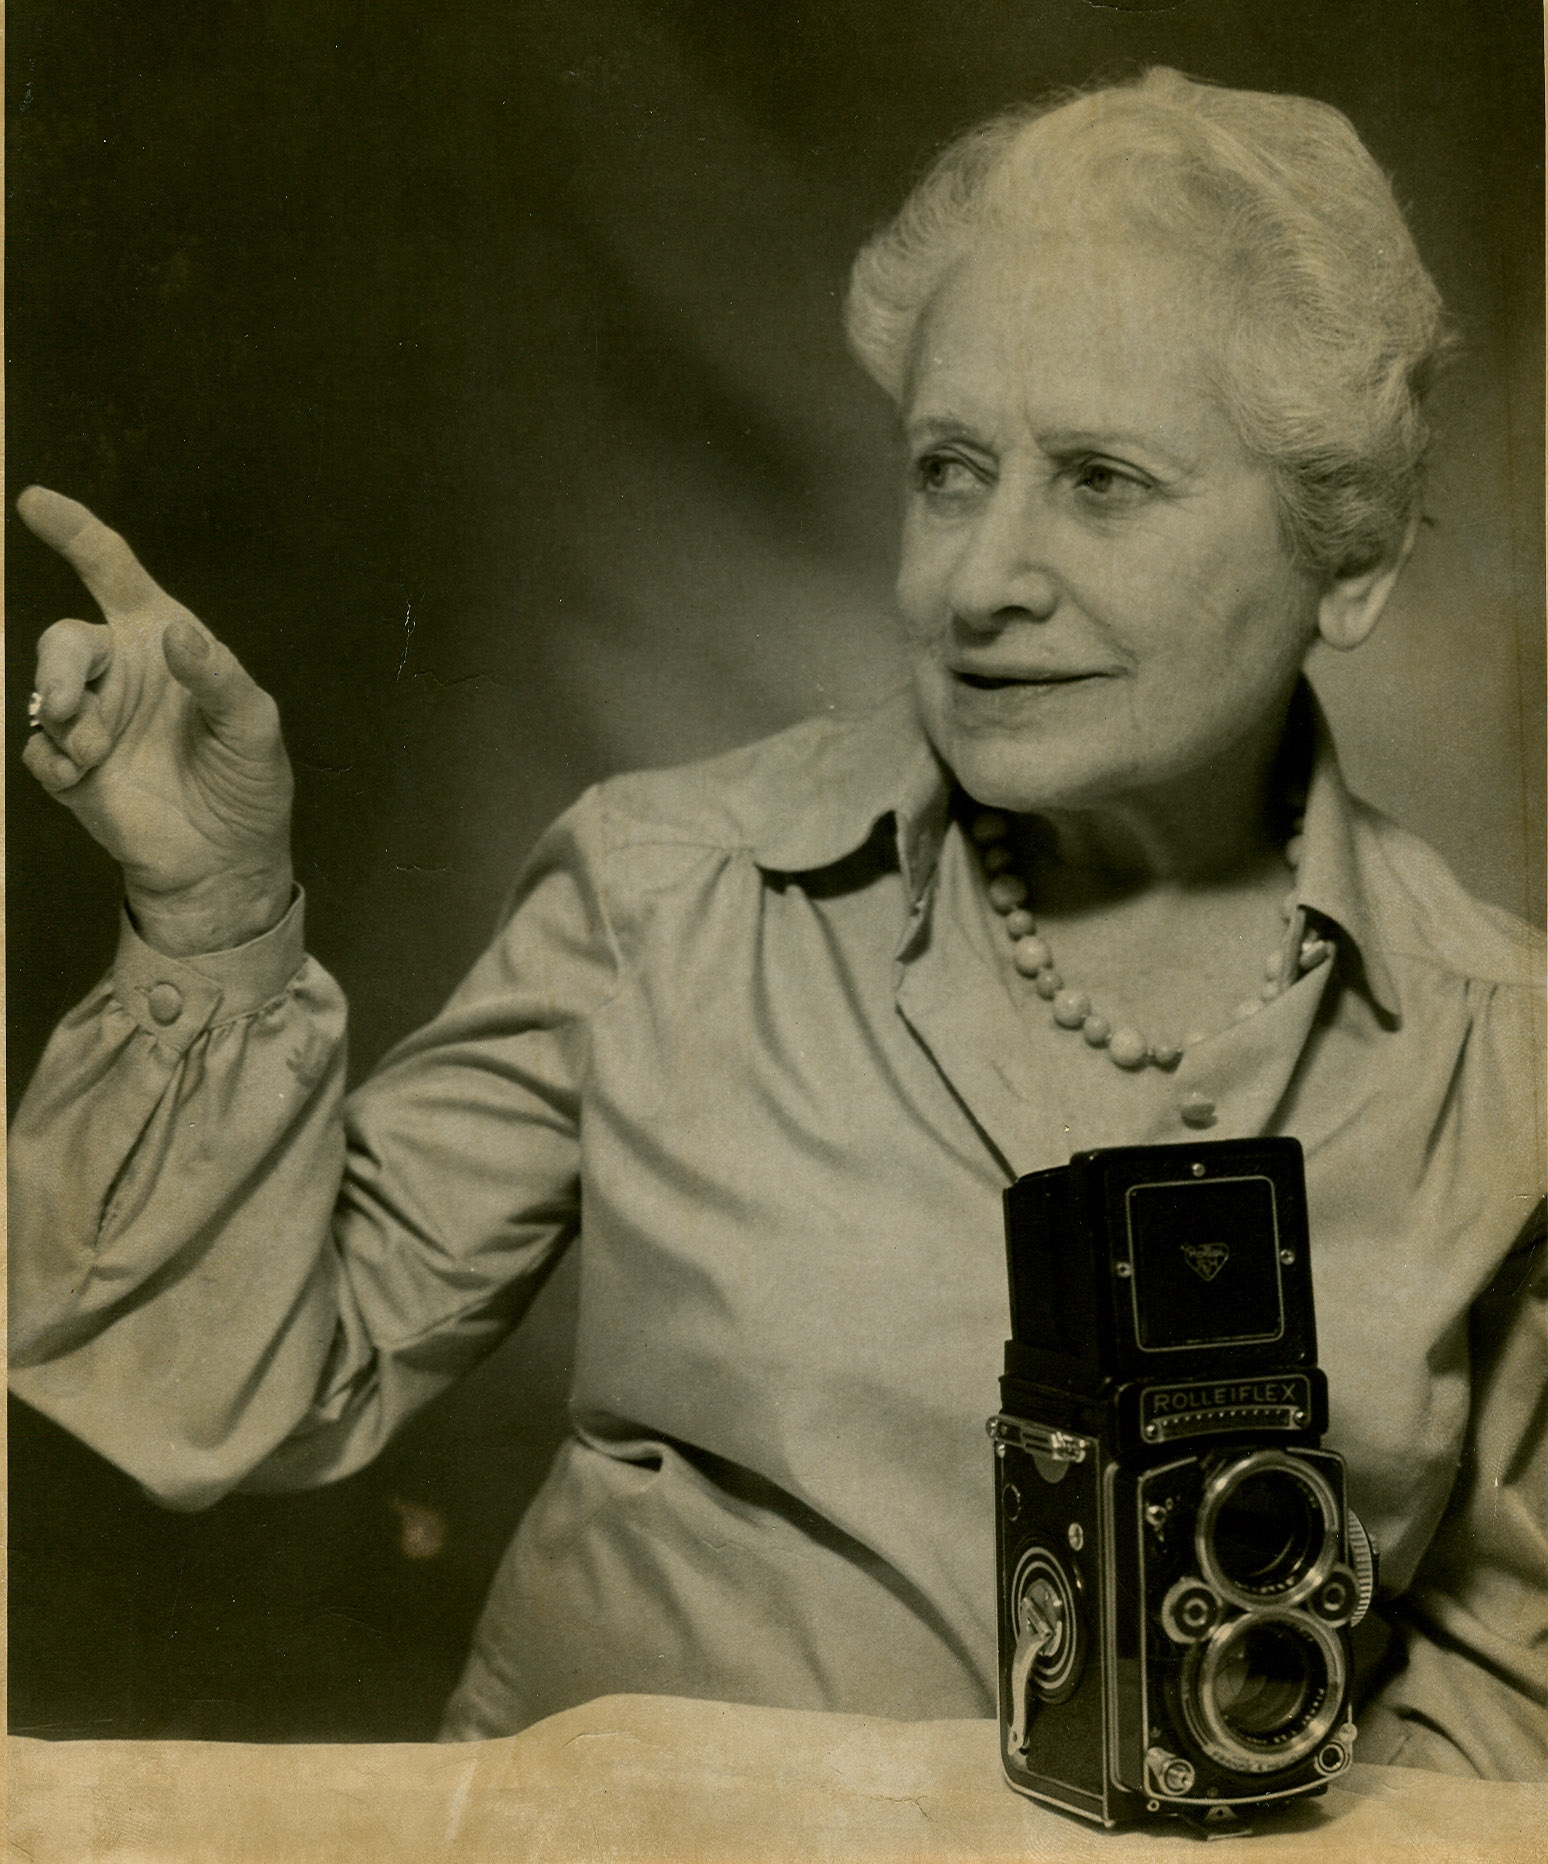 Paula with her Roloflex camera